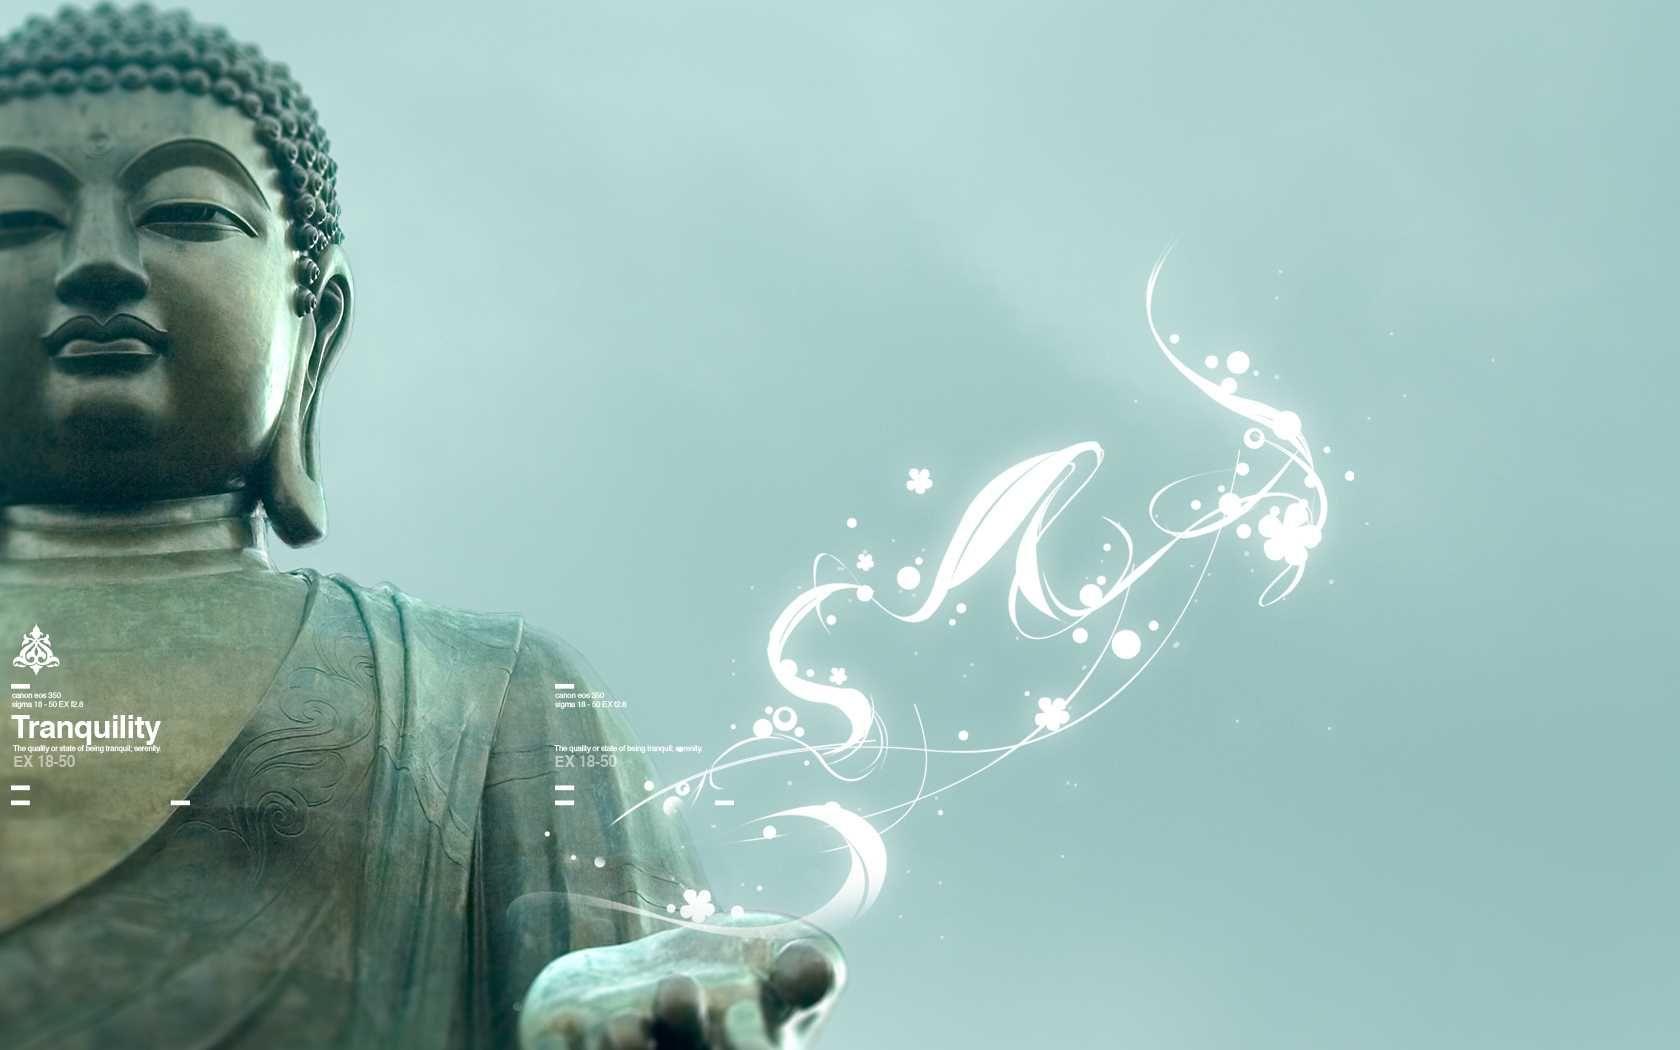 Buddha wallpaper for desktop and mobile ...